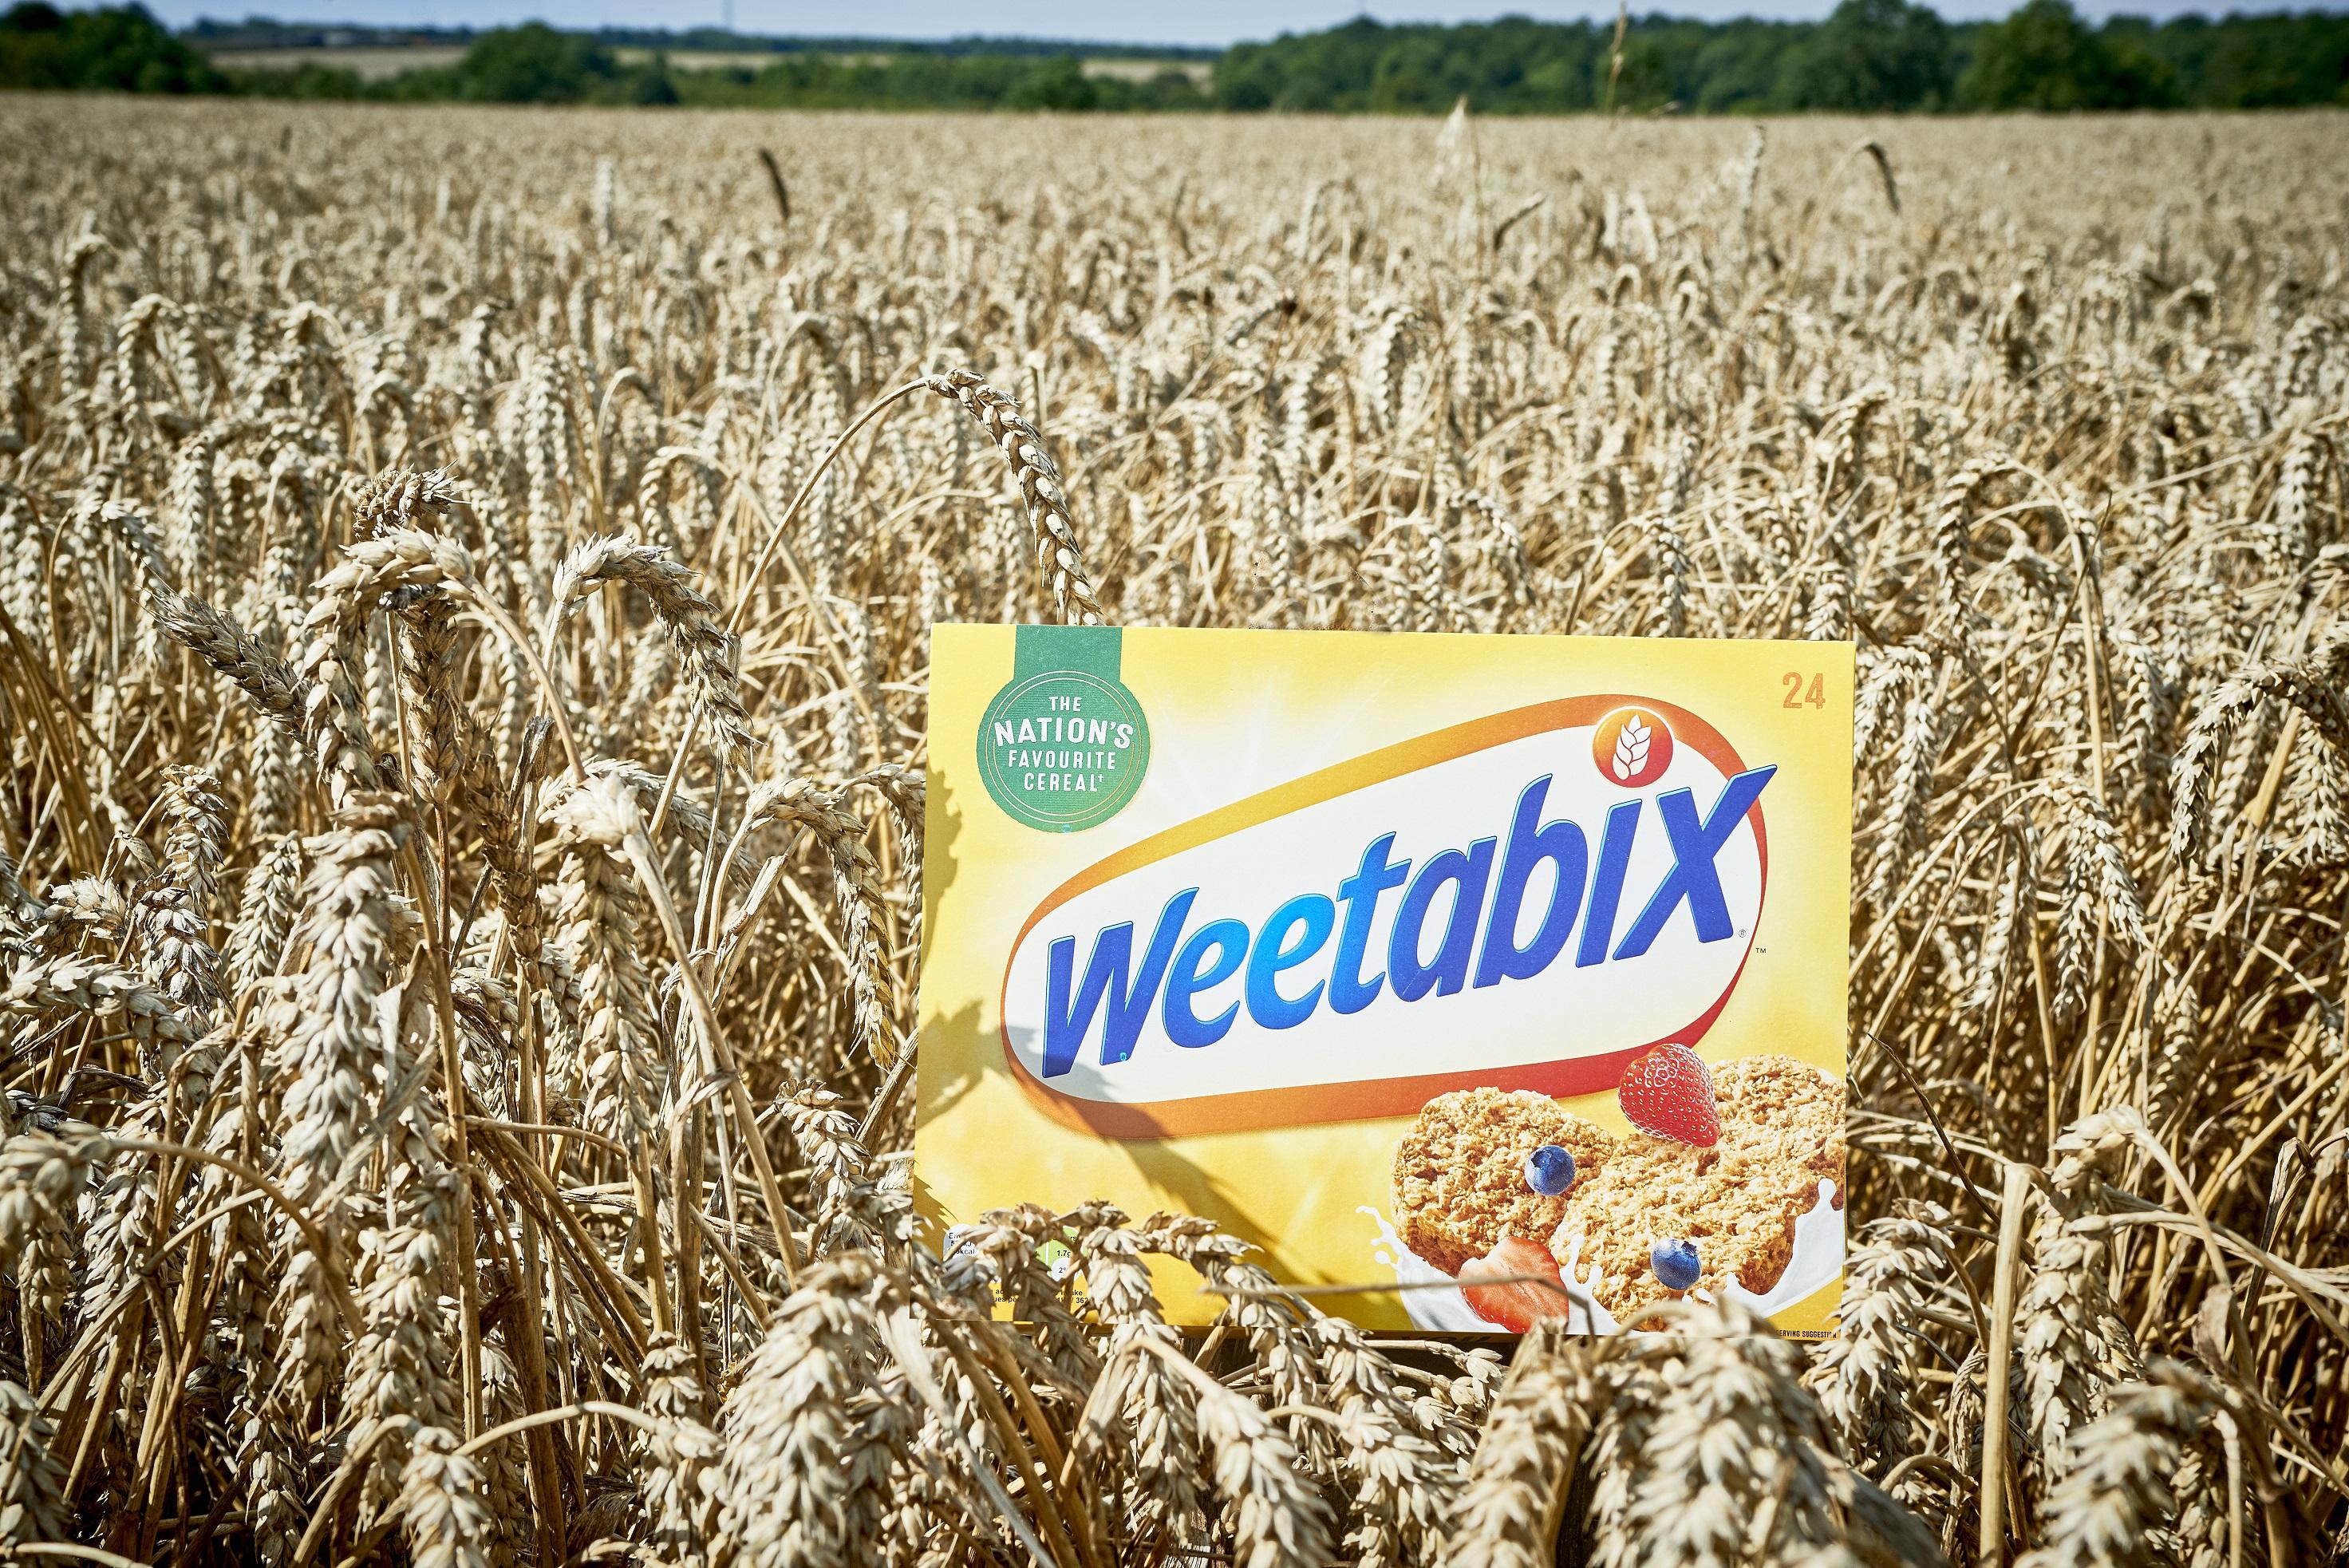 Weetabix---Harvest-1